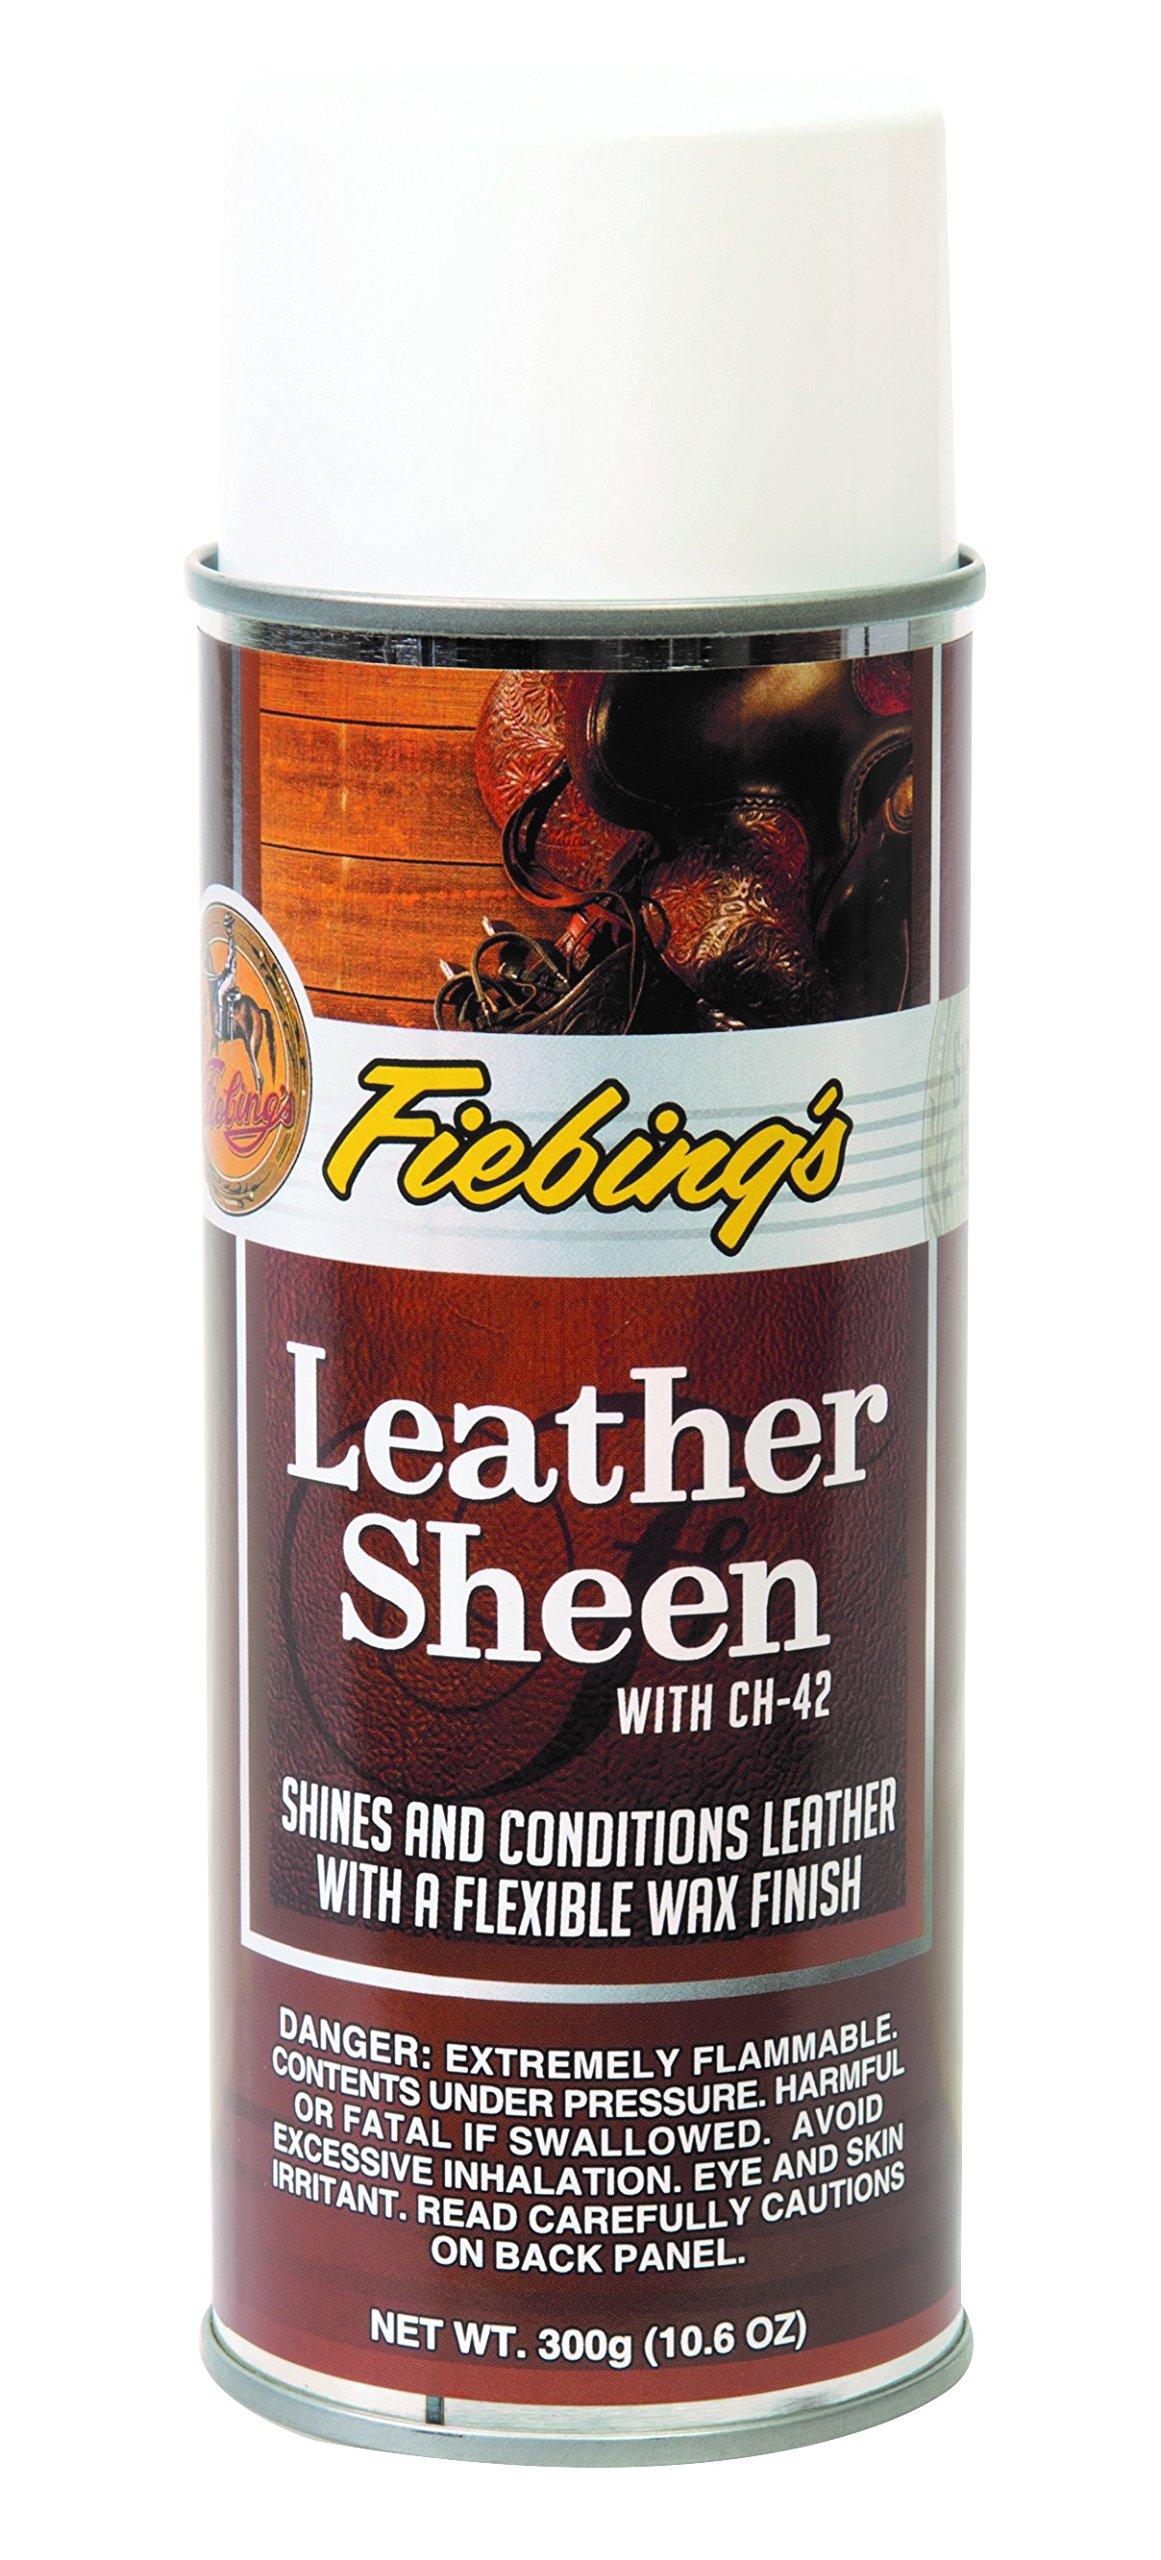 Fiebing's Leather Sheen, 10.6 oz, Clear by Fiebing's